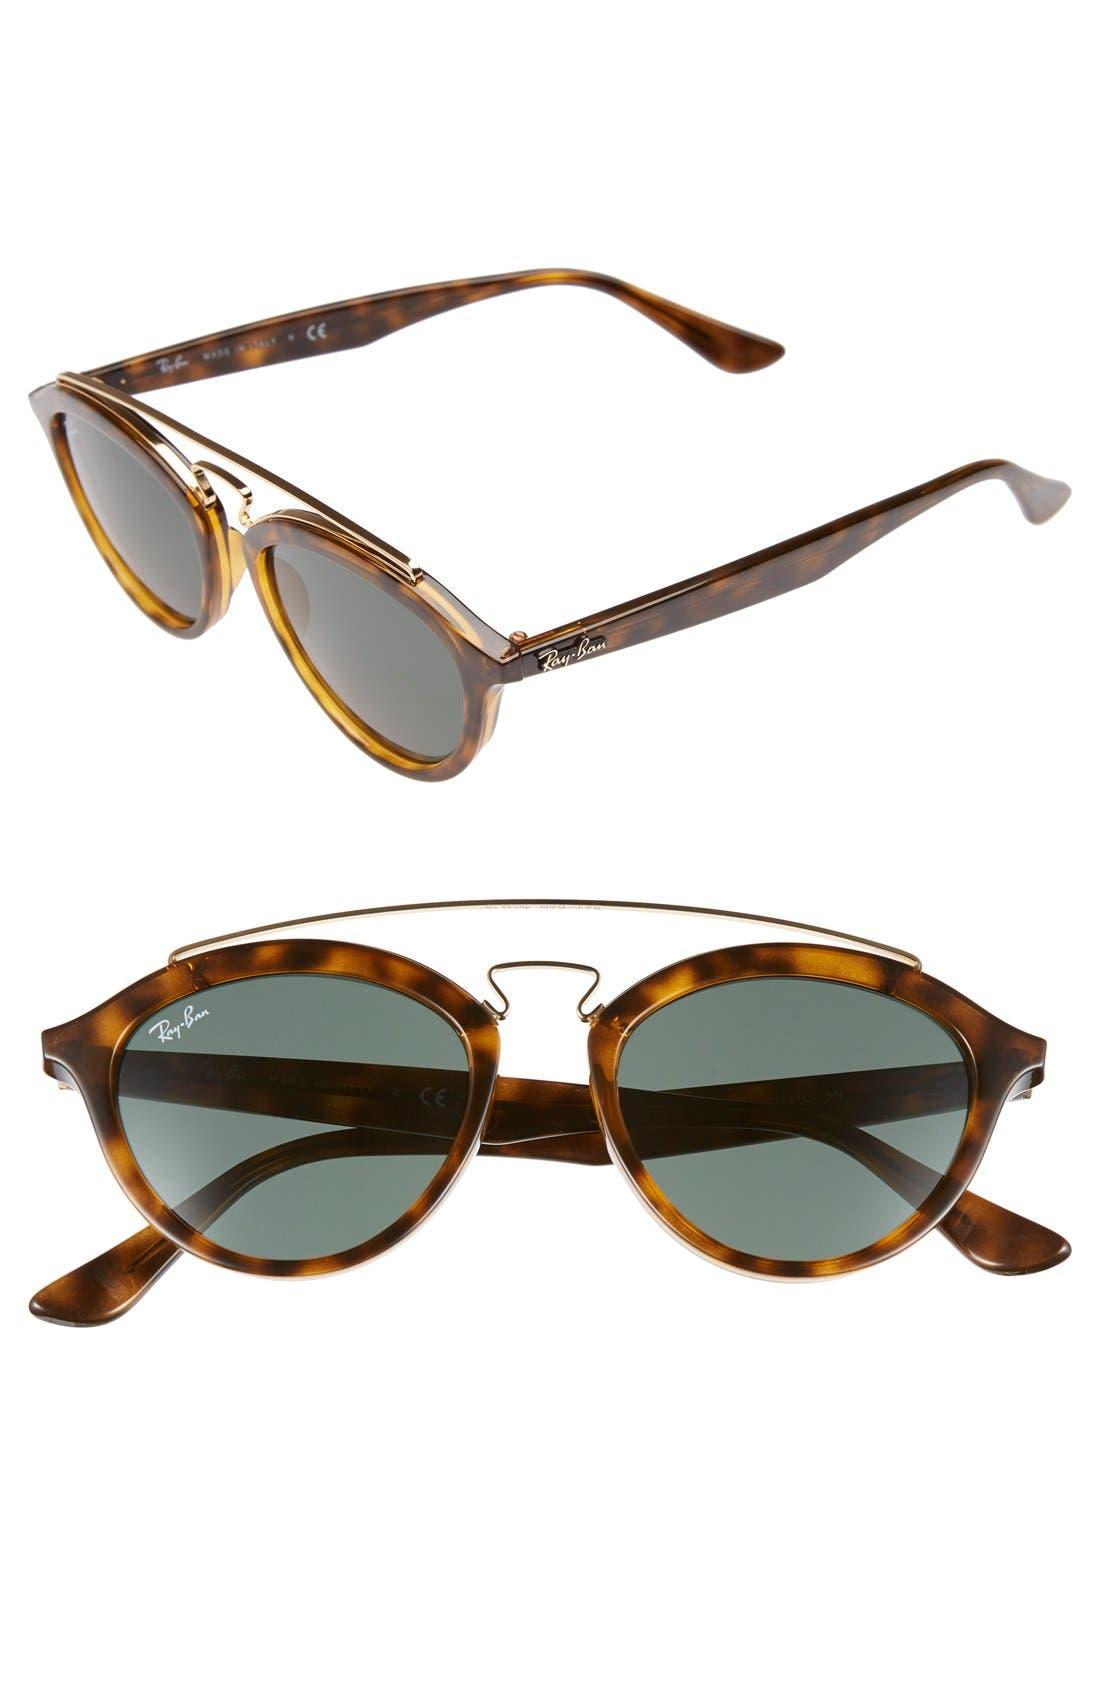 Highstreet 50mm Brow Bar Sunglasses,                             Main thumbnail 4, color,